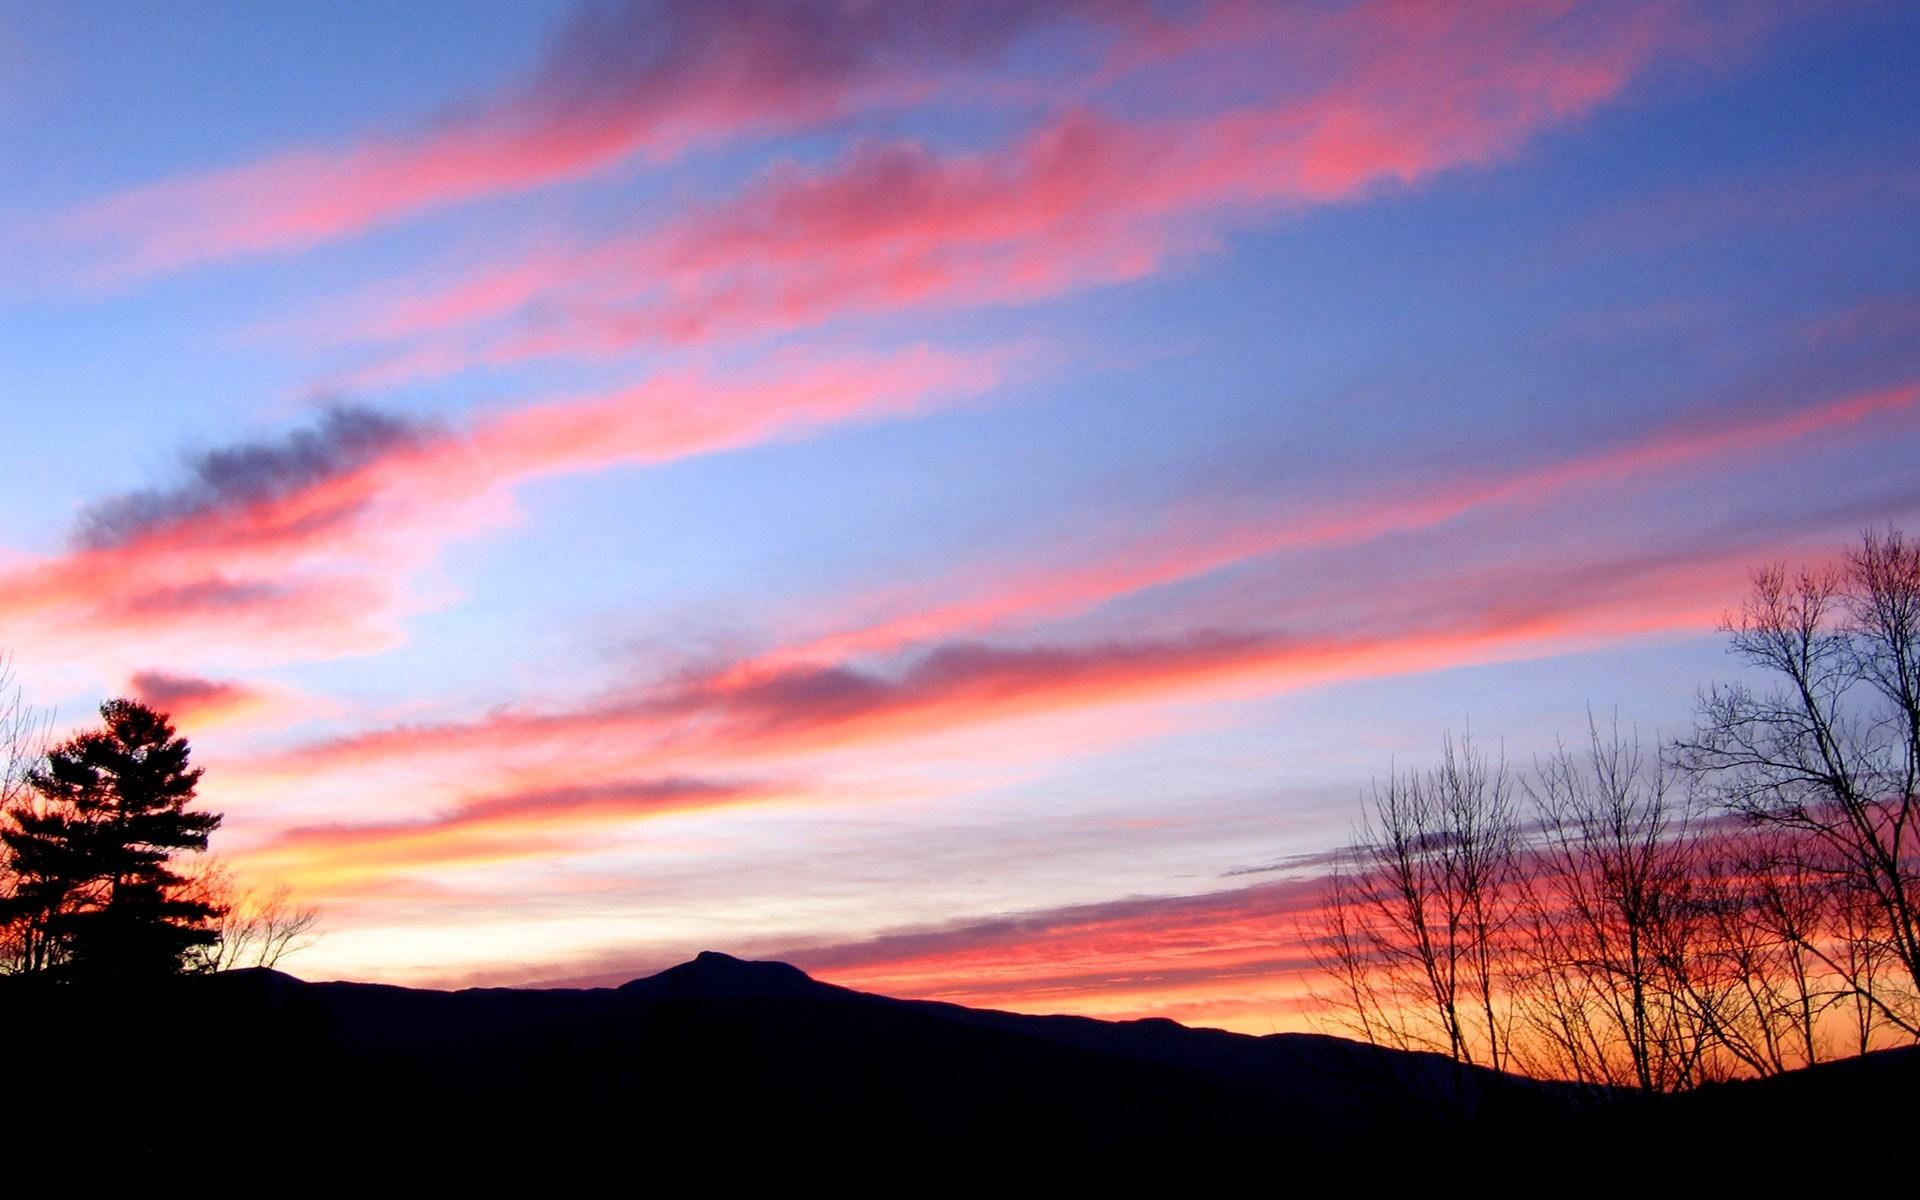 Sfondi tramonto 59 immagini for Sfondi desktop tramonti